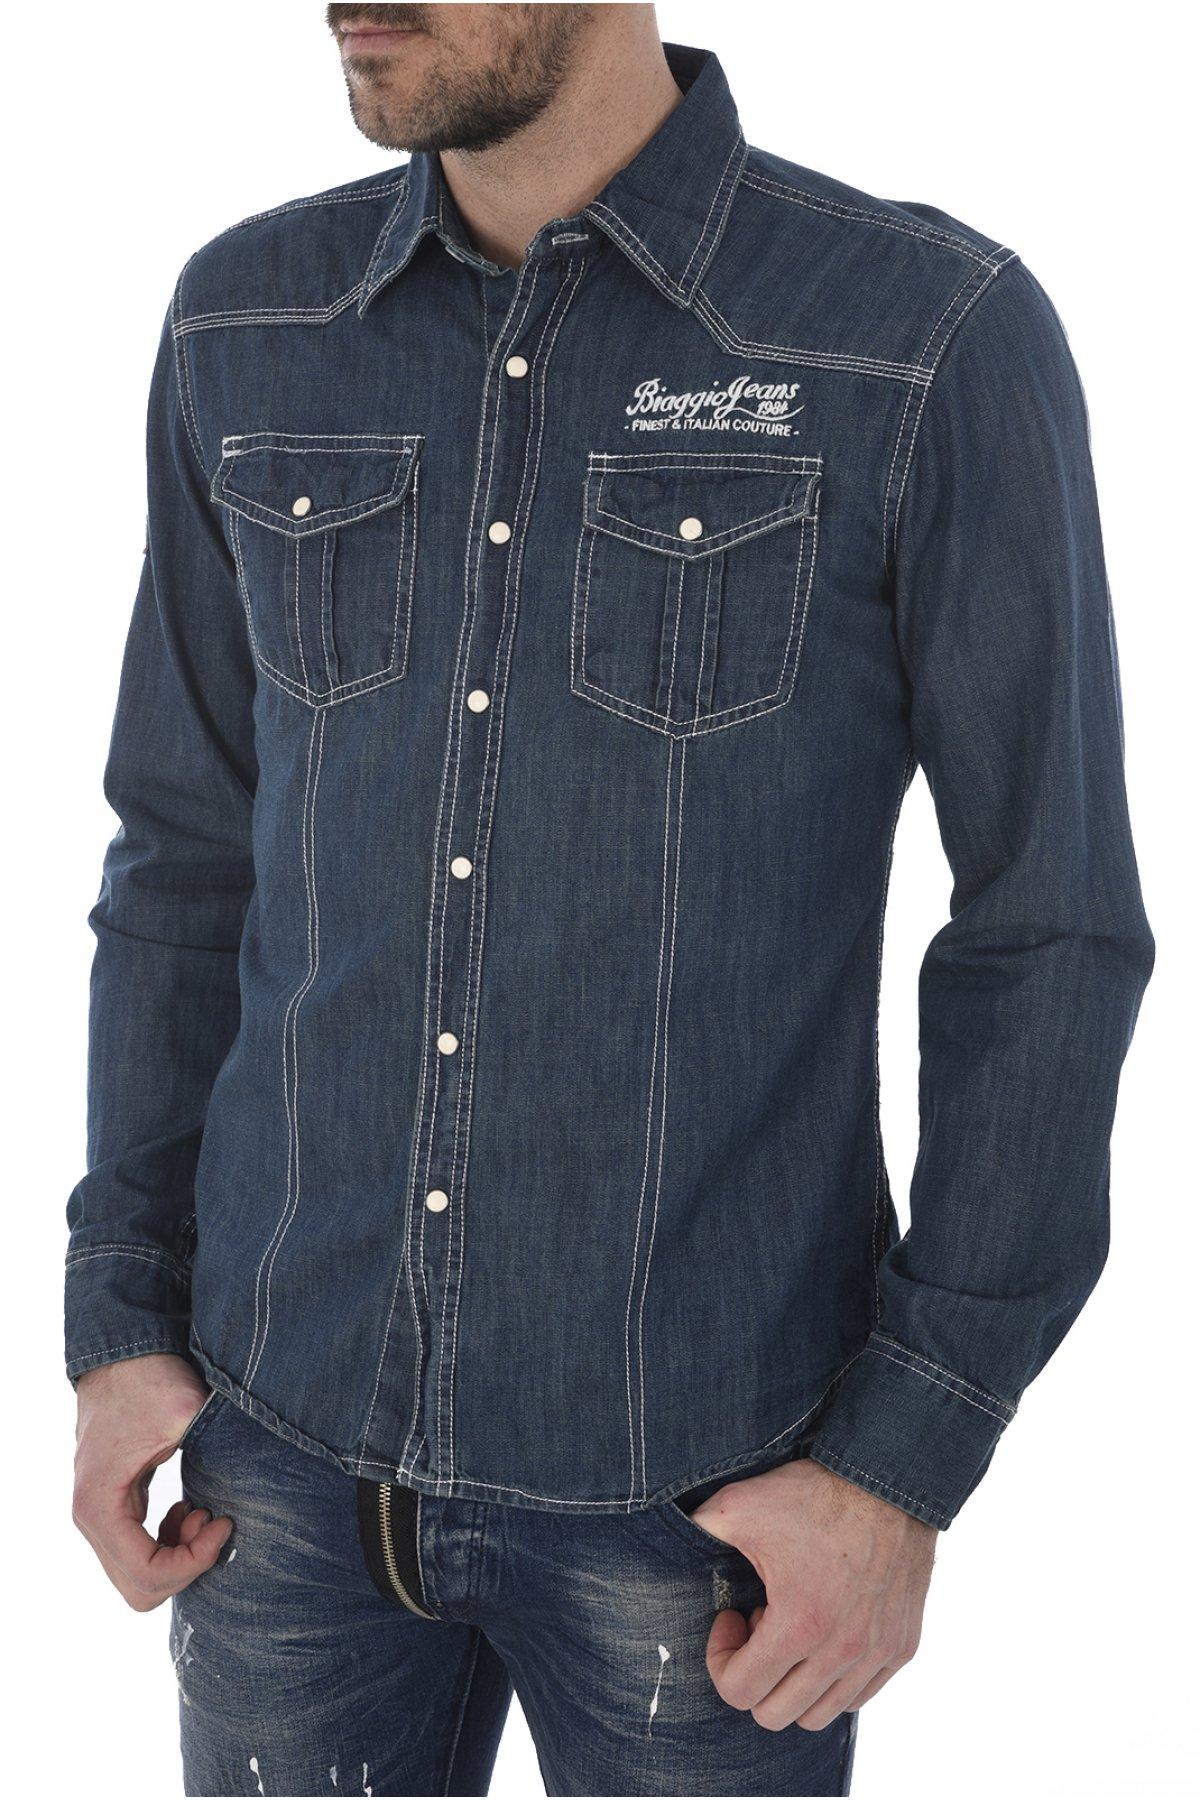 Chemise Coton Denim Fantaisie Caforal - Biaggio Jeans